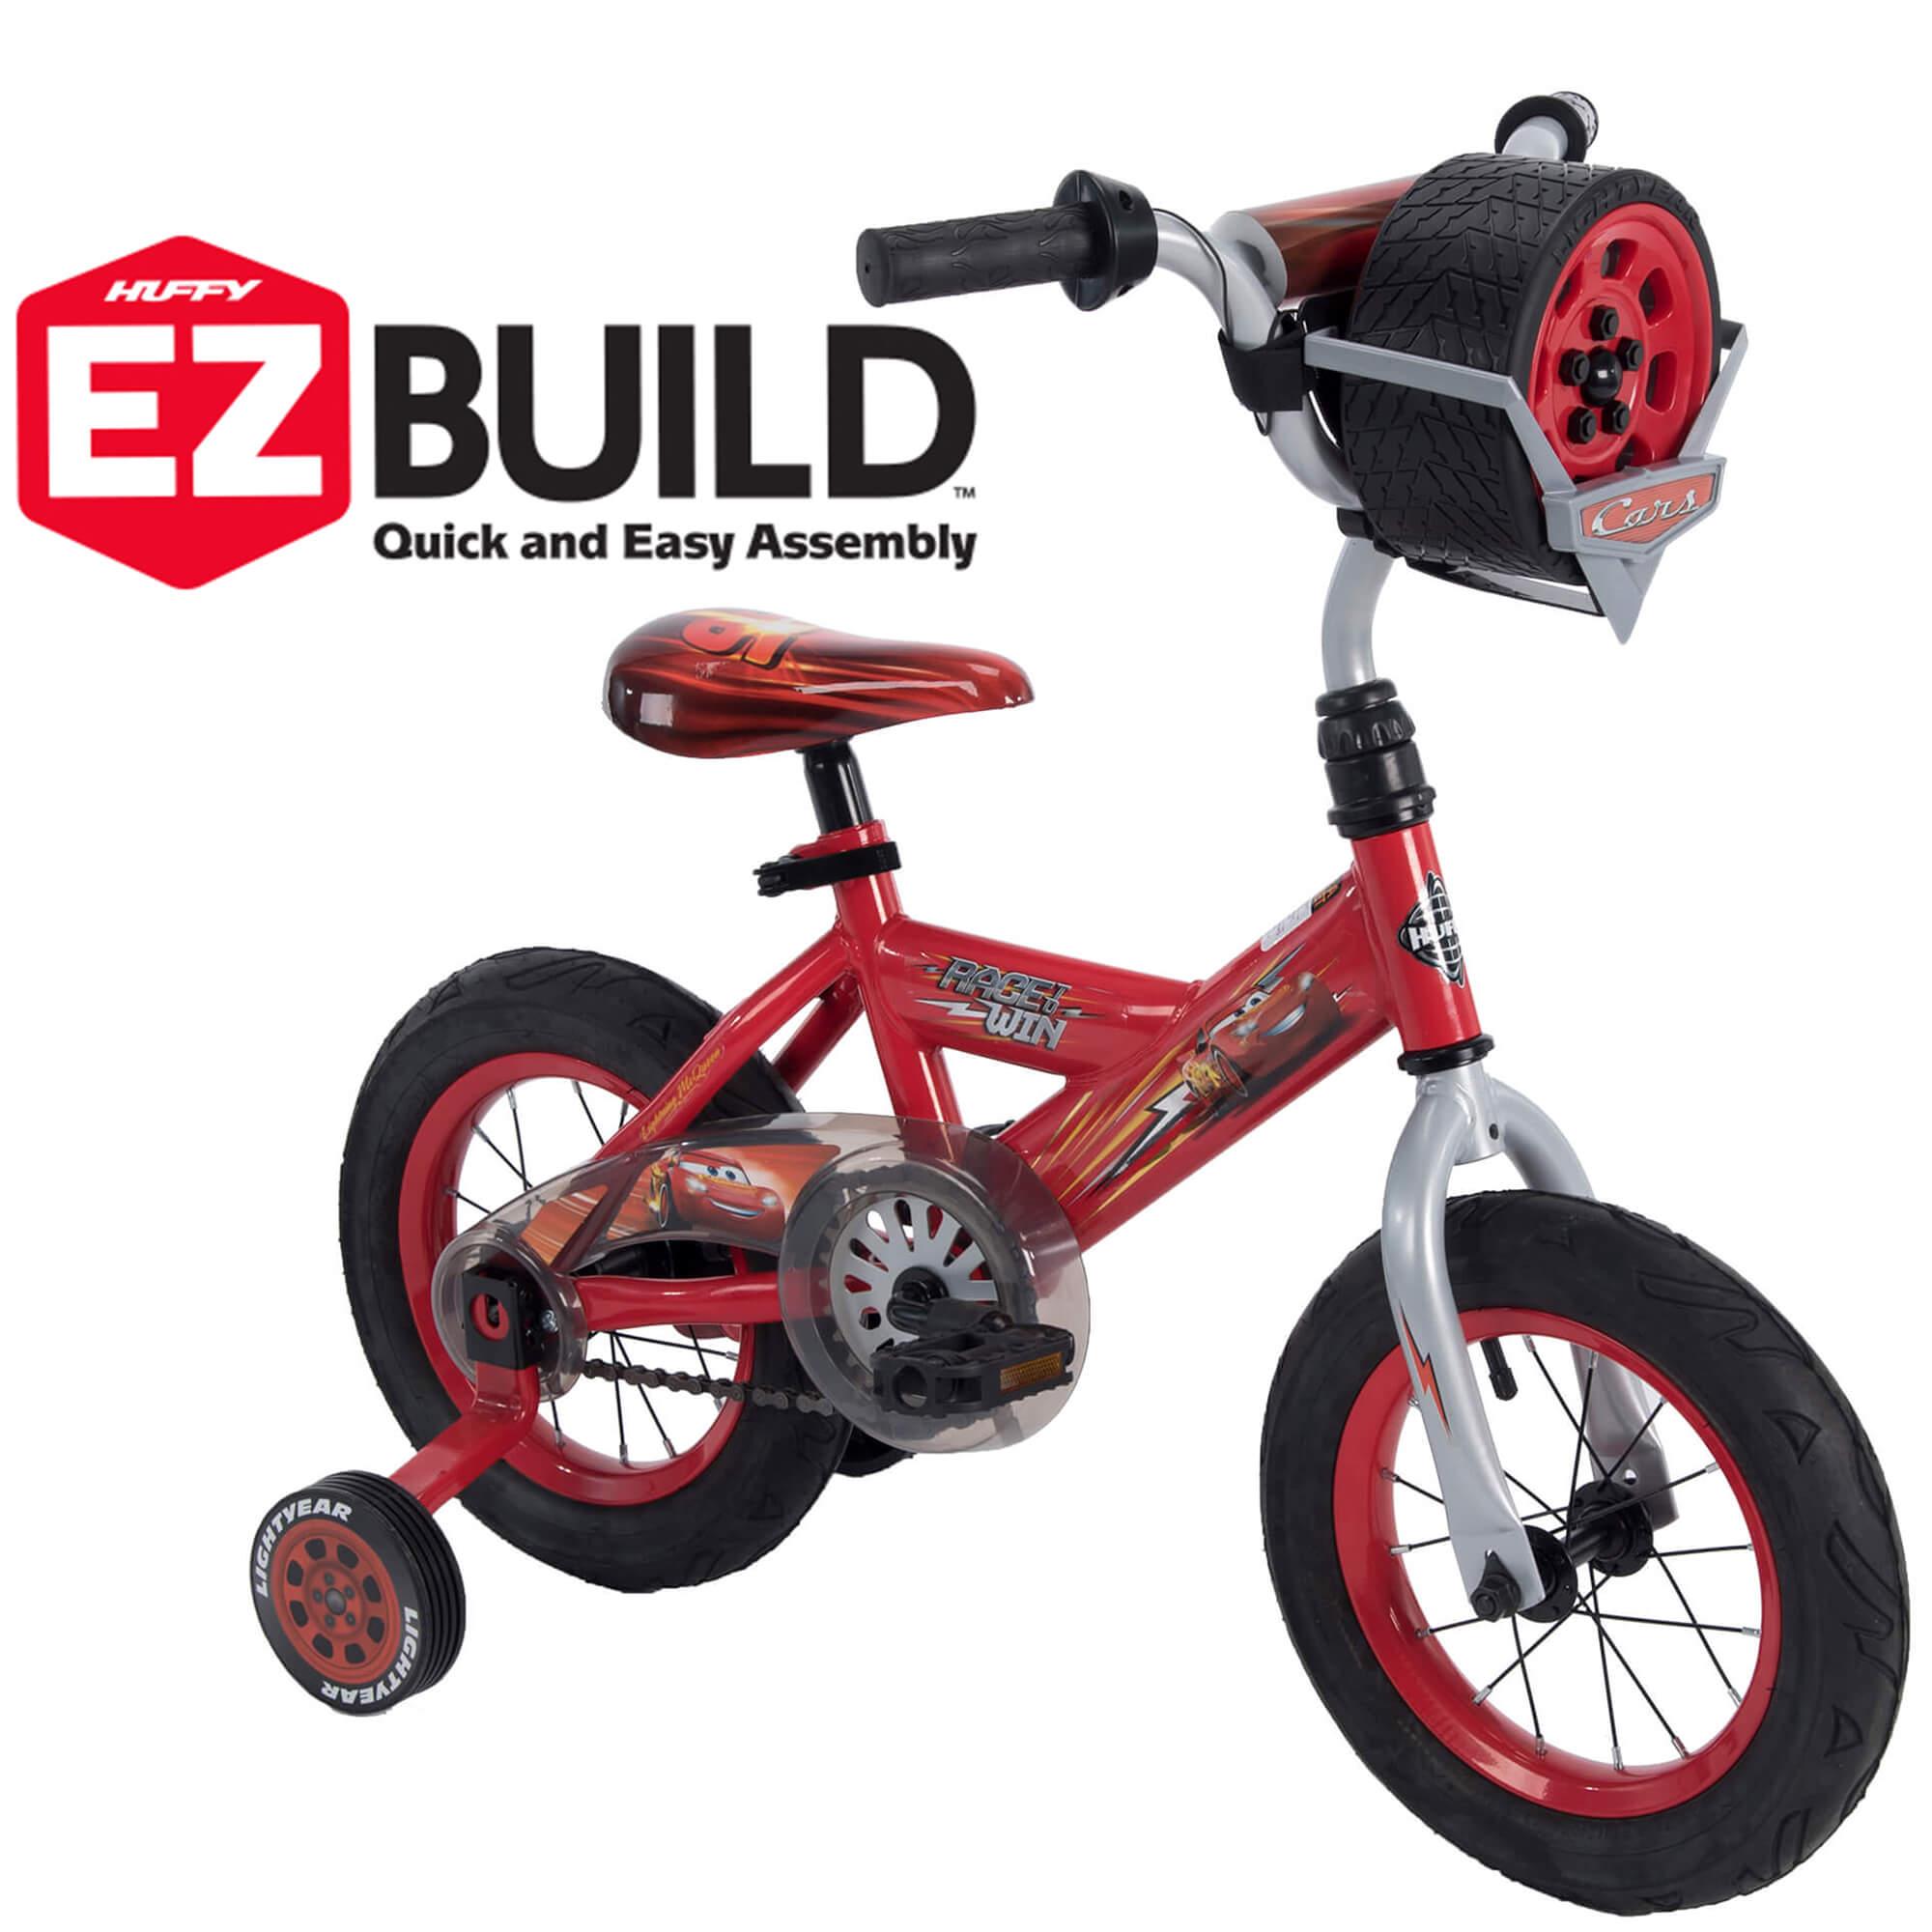 "Huffy 12"" Disney / Pixar Cars Lightning McQueen Kids Bike with Sounds, Red"